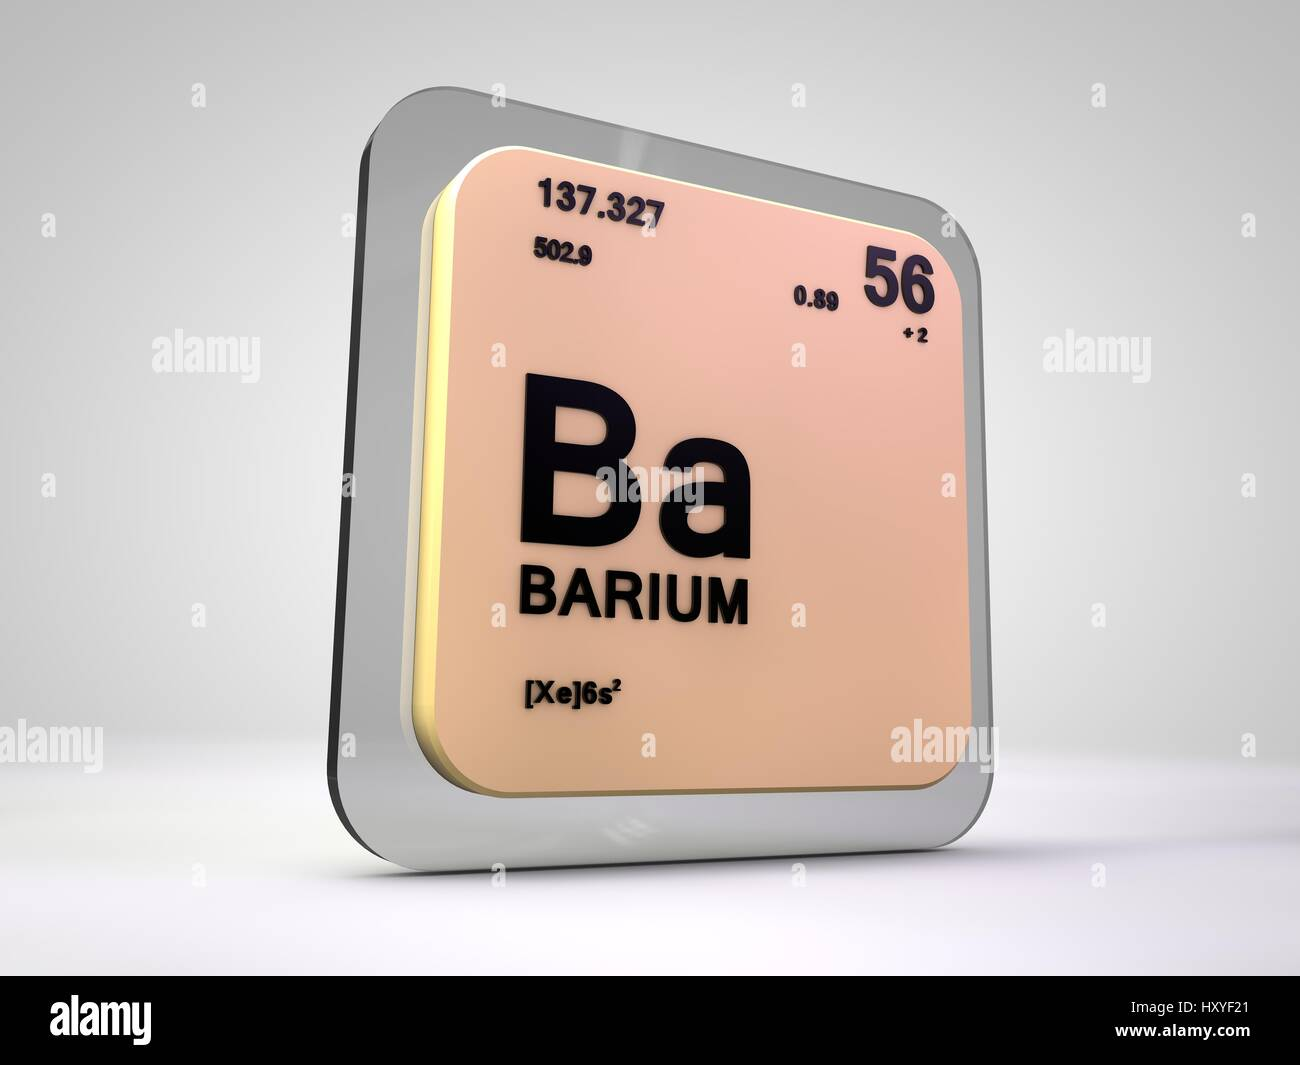 Barium - Ba - chemical element periodic table 3d render - Stock Image